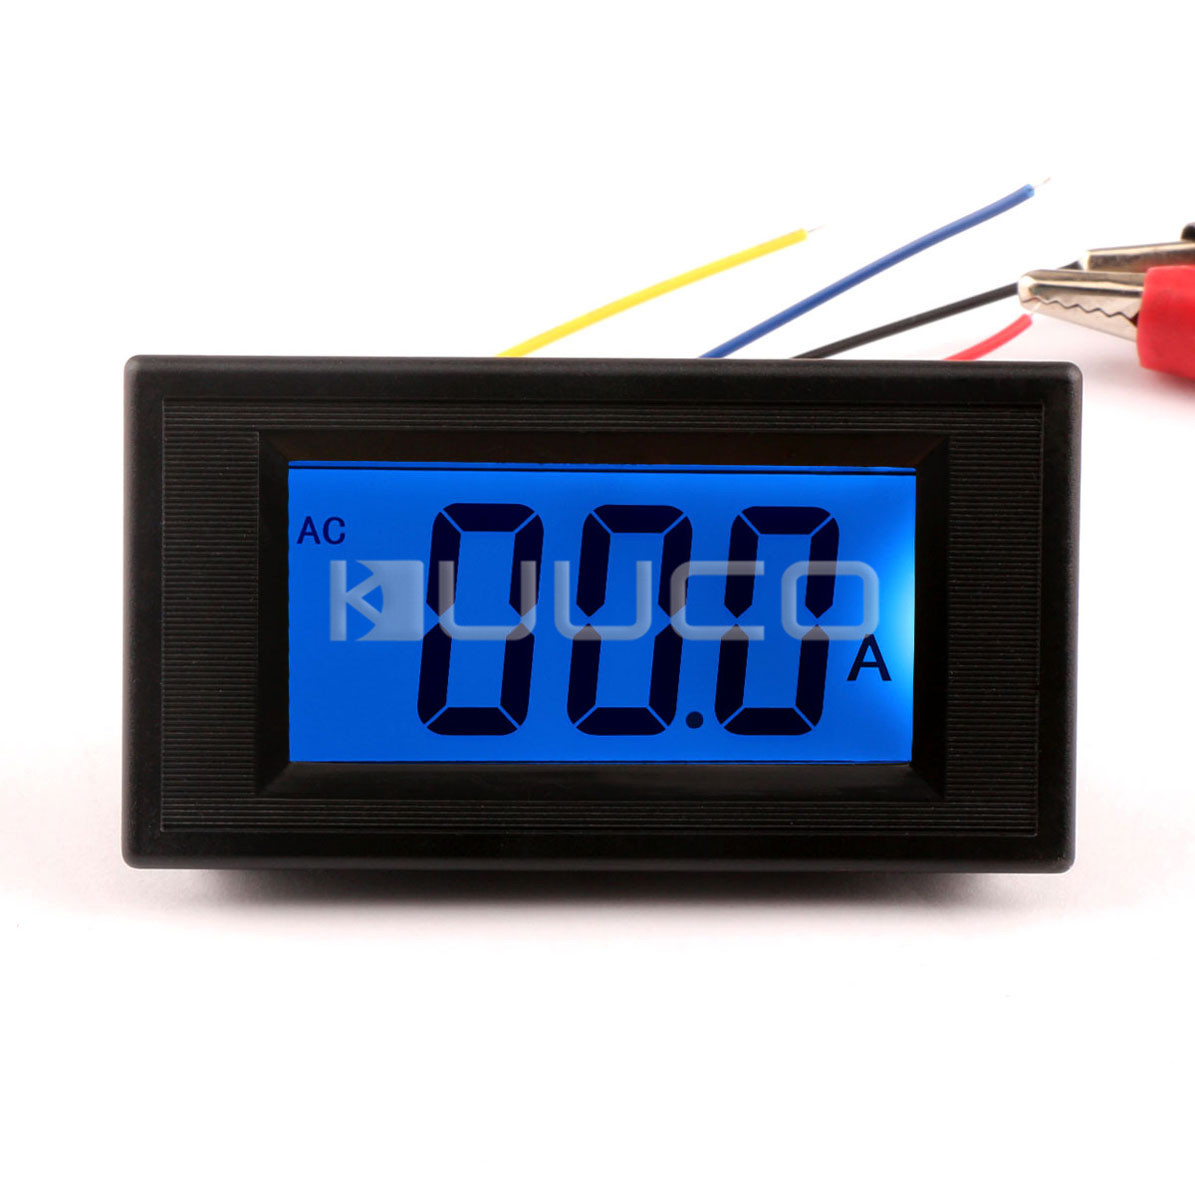 medium resolution of digital meter ac 0 100a blue lcd display digital ammeter ac dc 8v 12v amp meter gauge ampere meter shunt resistor in instrument parts accessories from